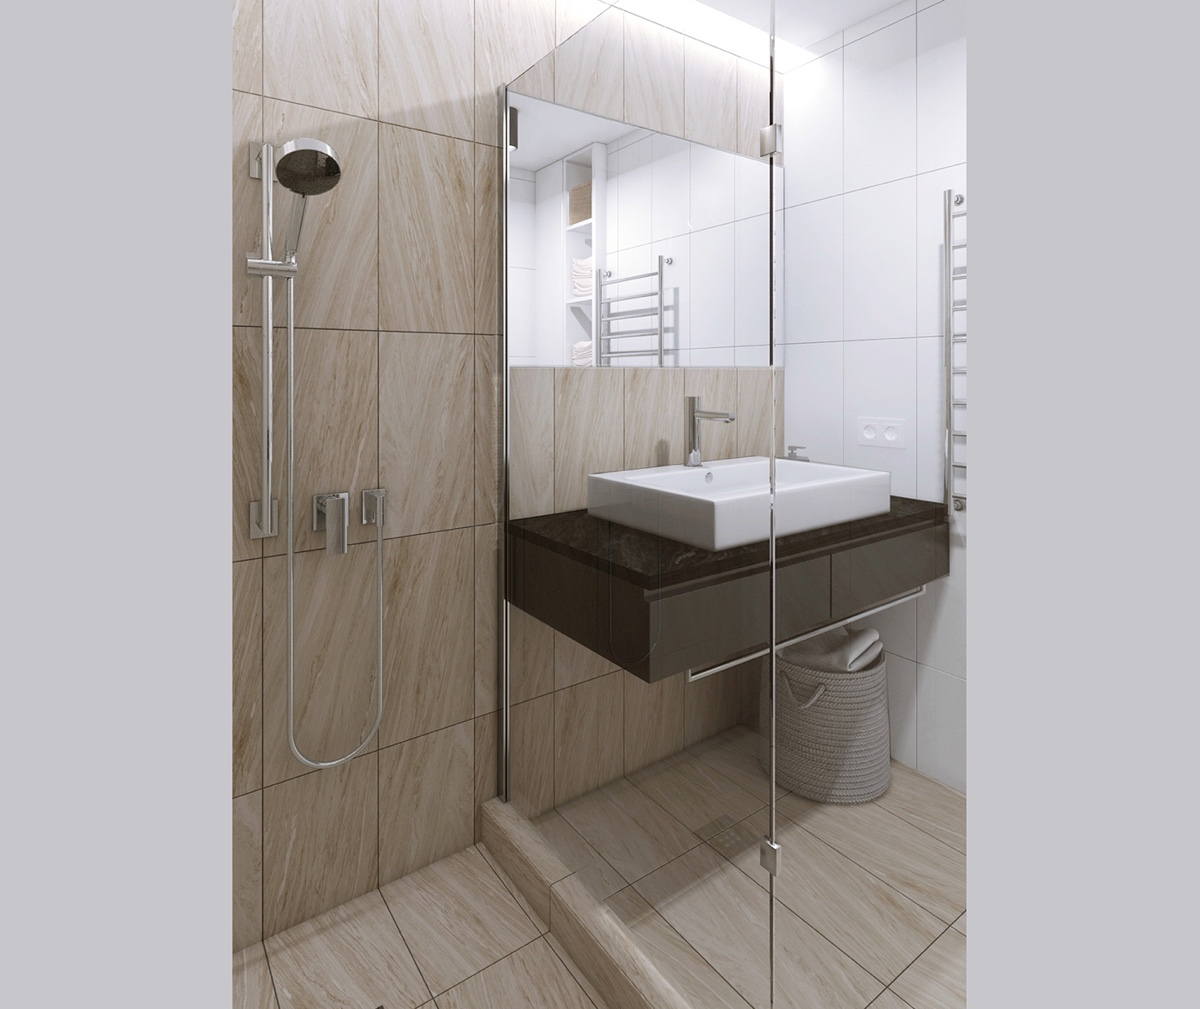 bathroom-tile-with-wood-grain-texture